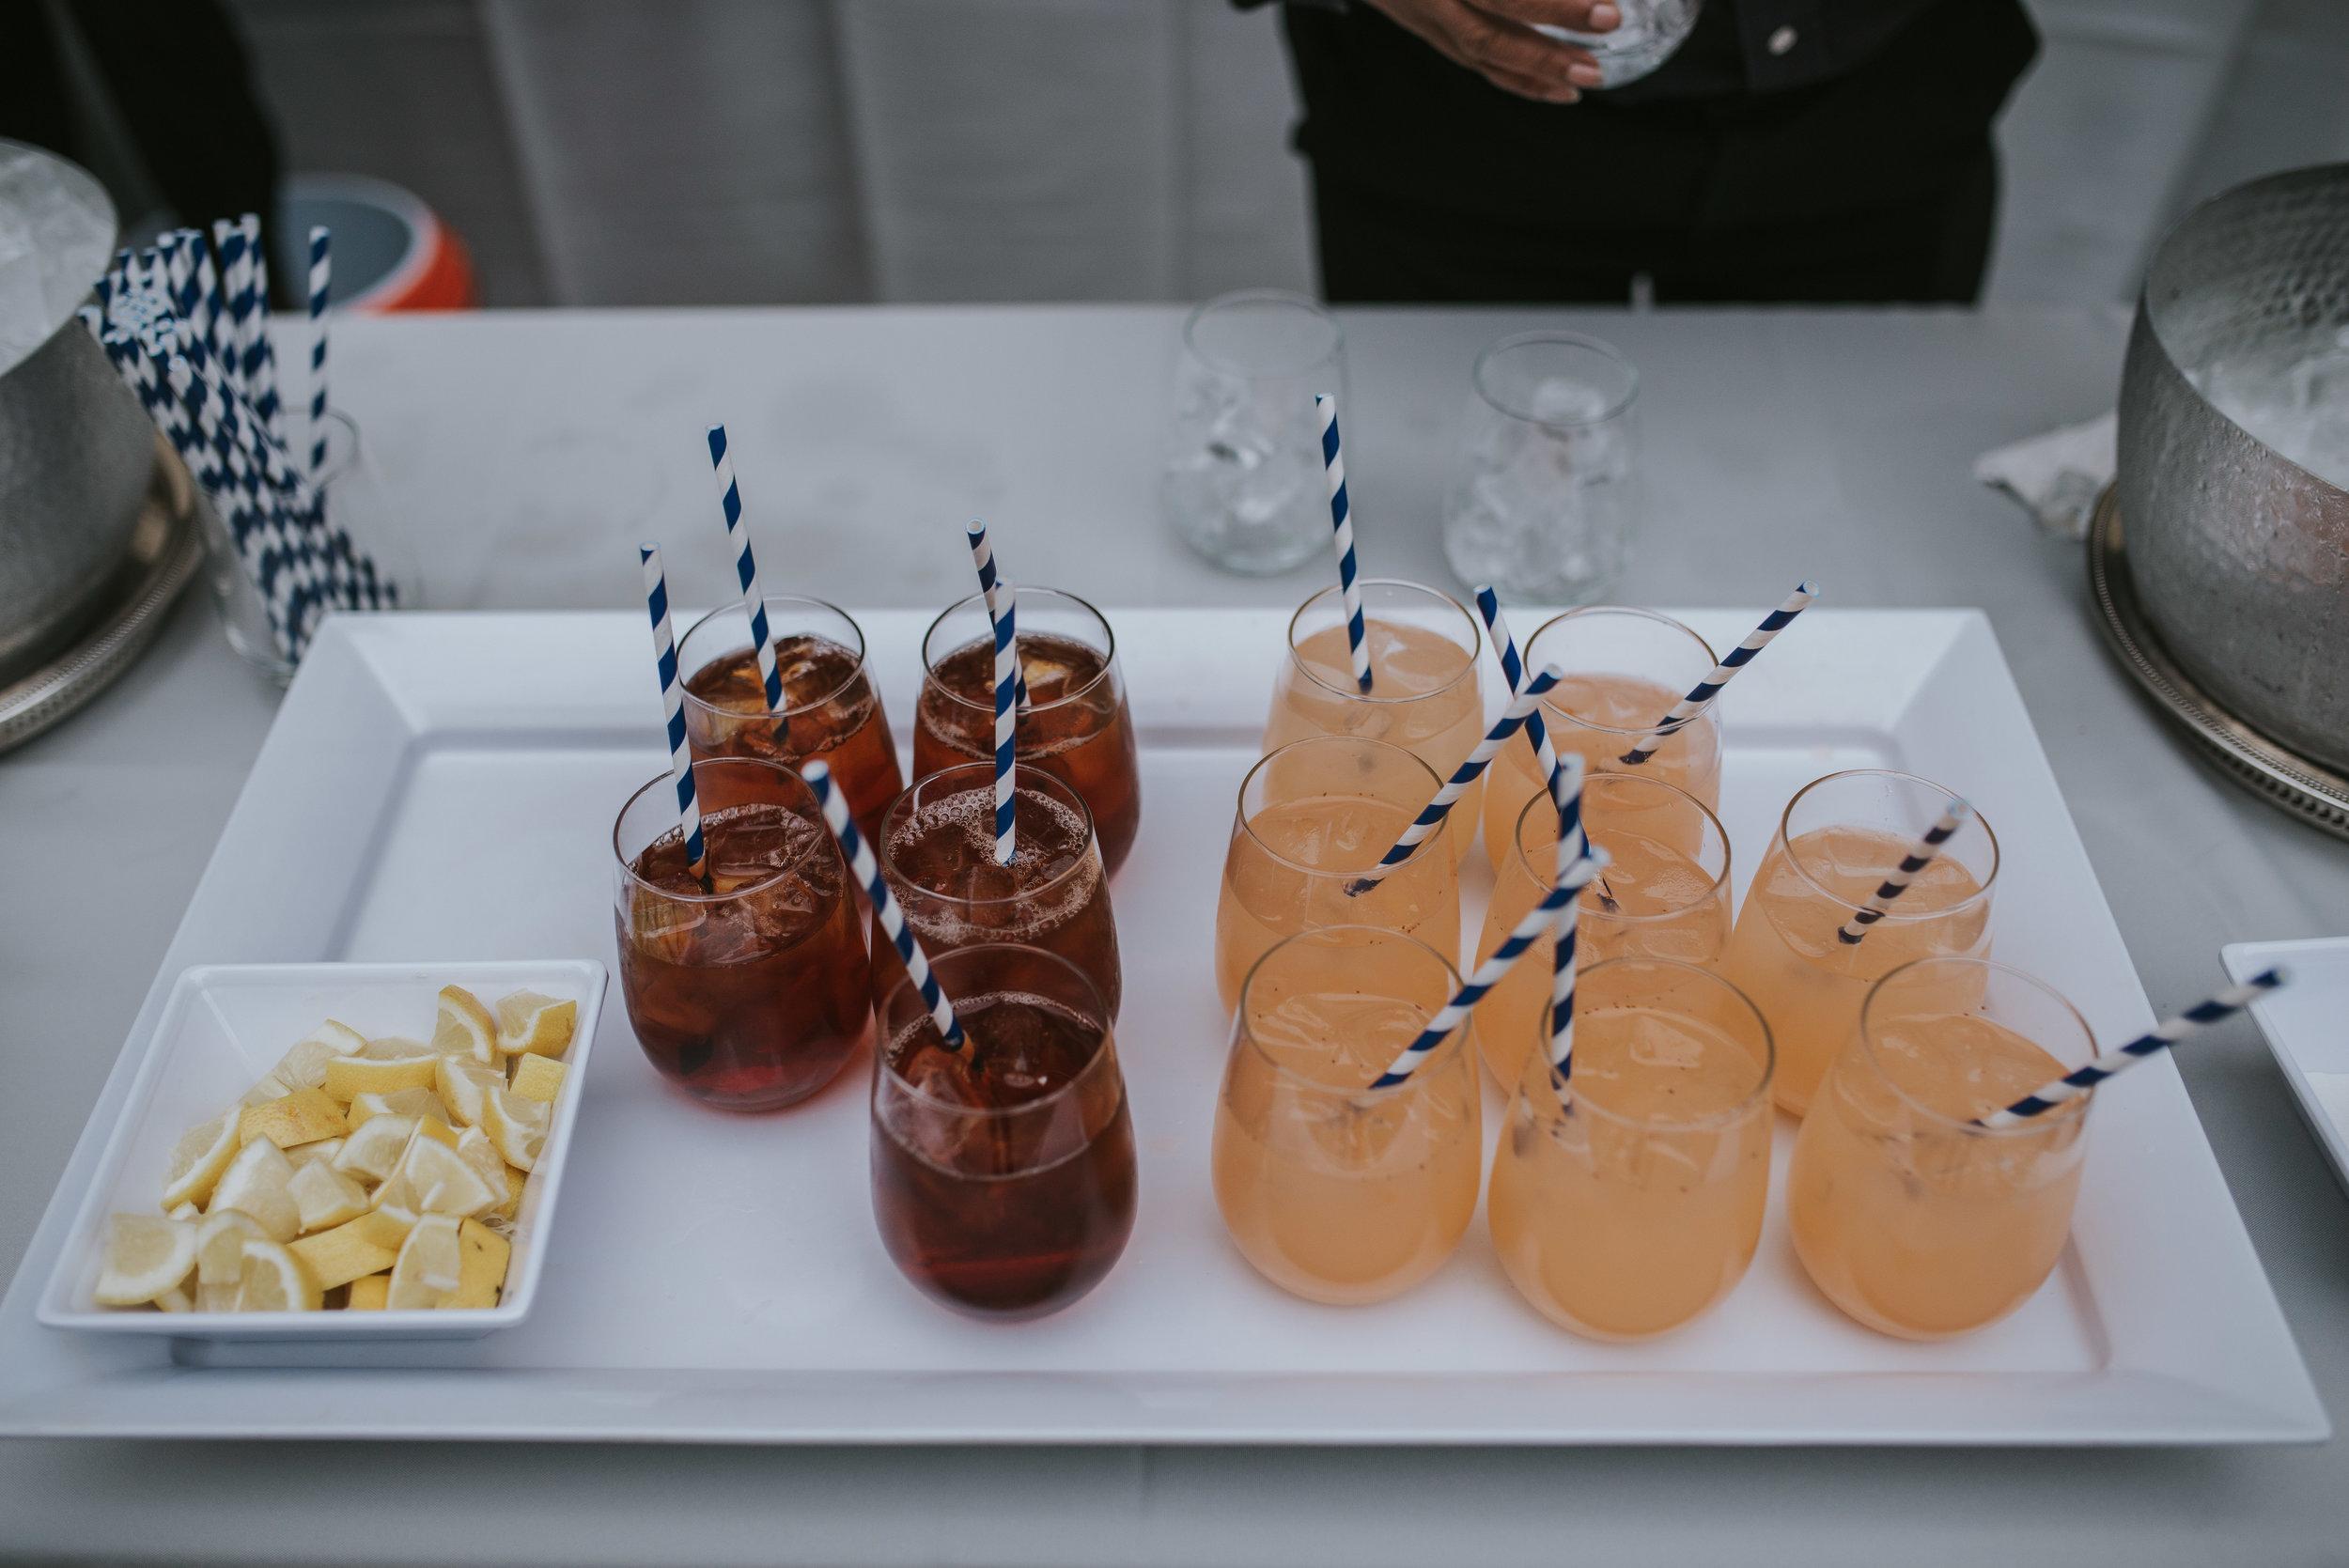 Cocktail hour refreshments at Atlanta History Center